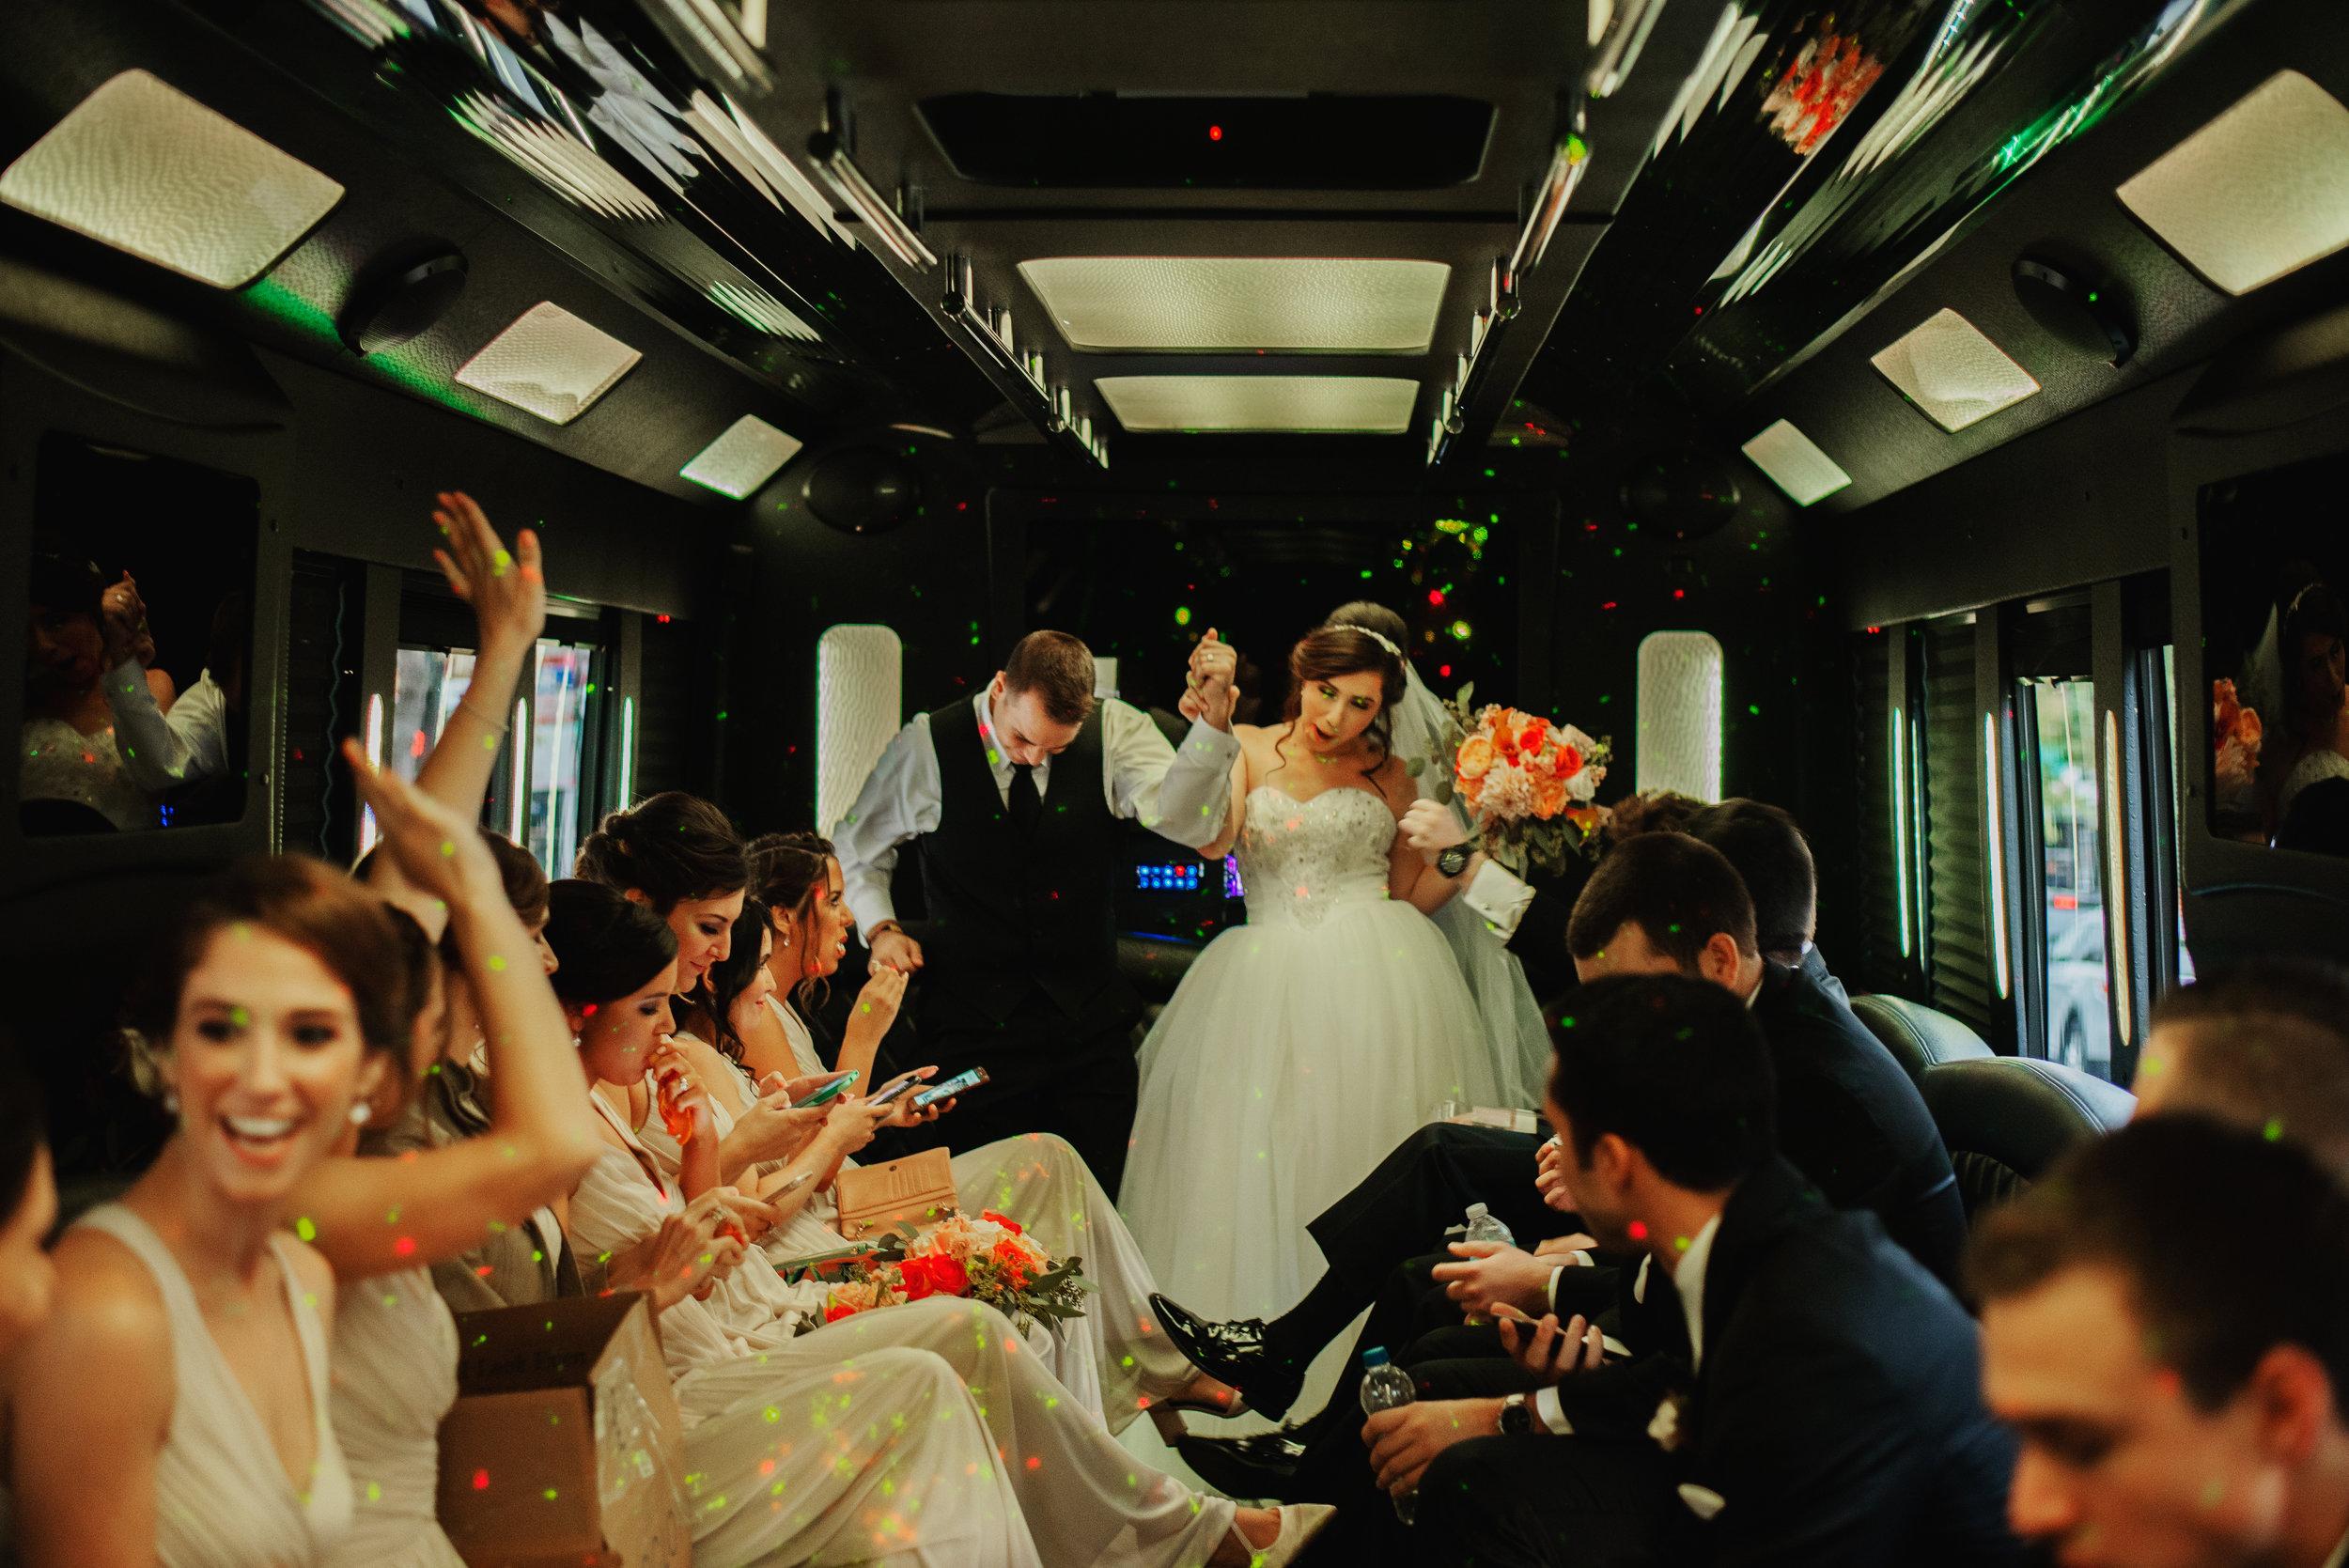 Barter-Party-Bus0008.jpg